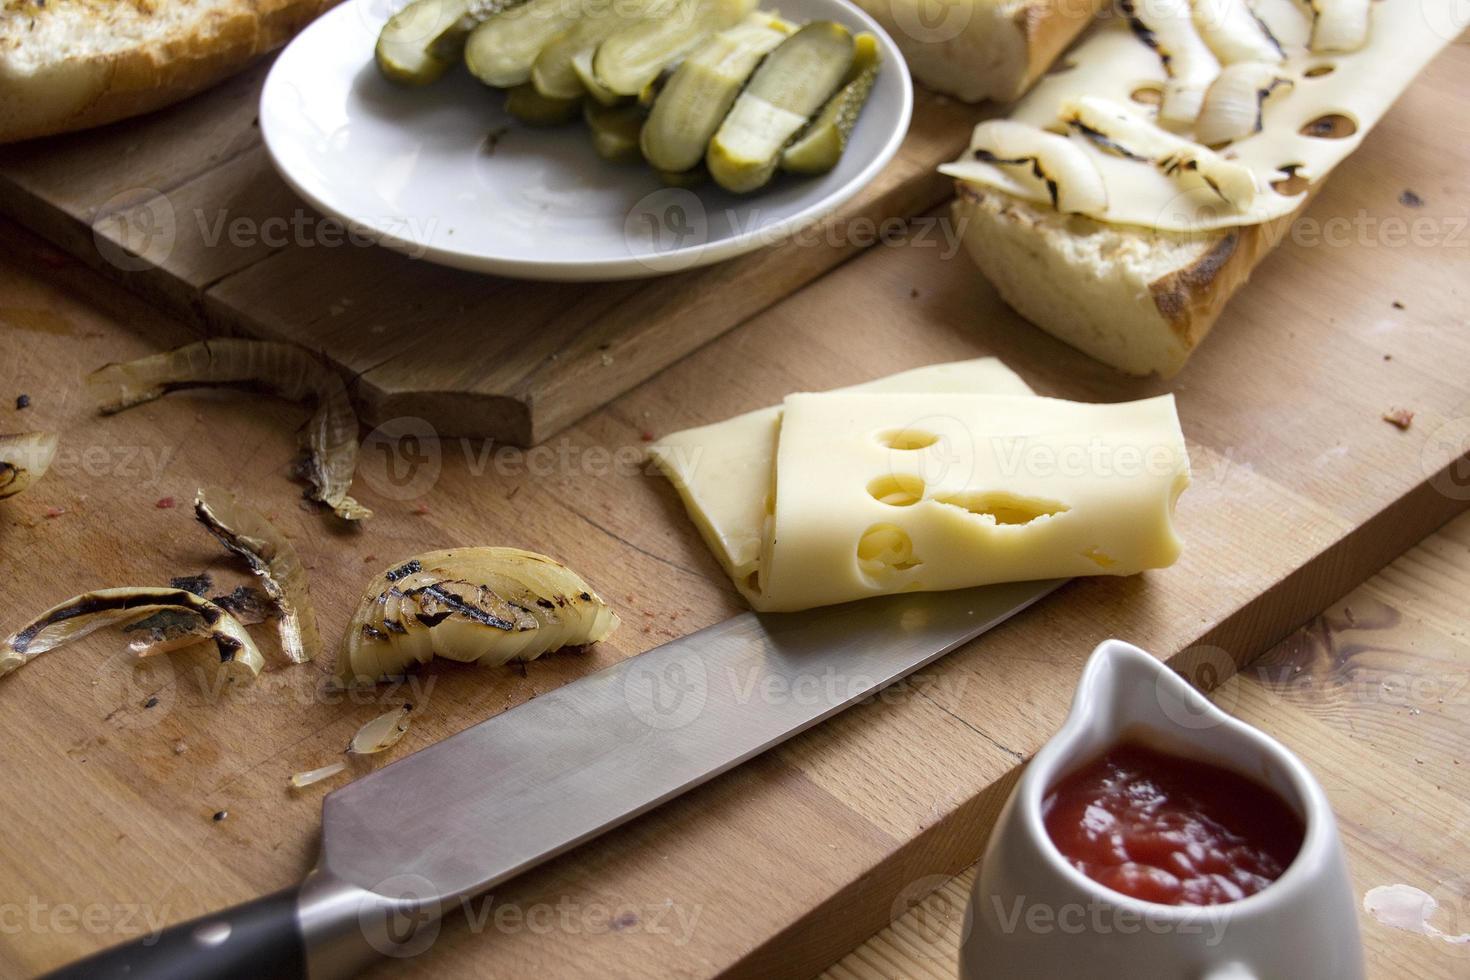 ingredientes do sanduíche foto